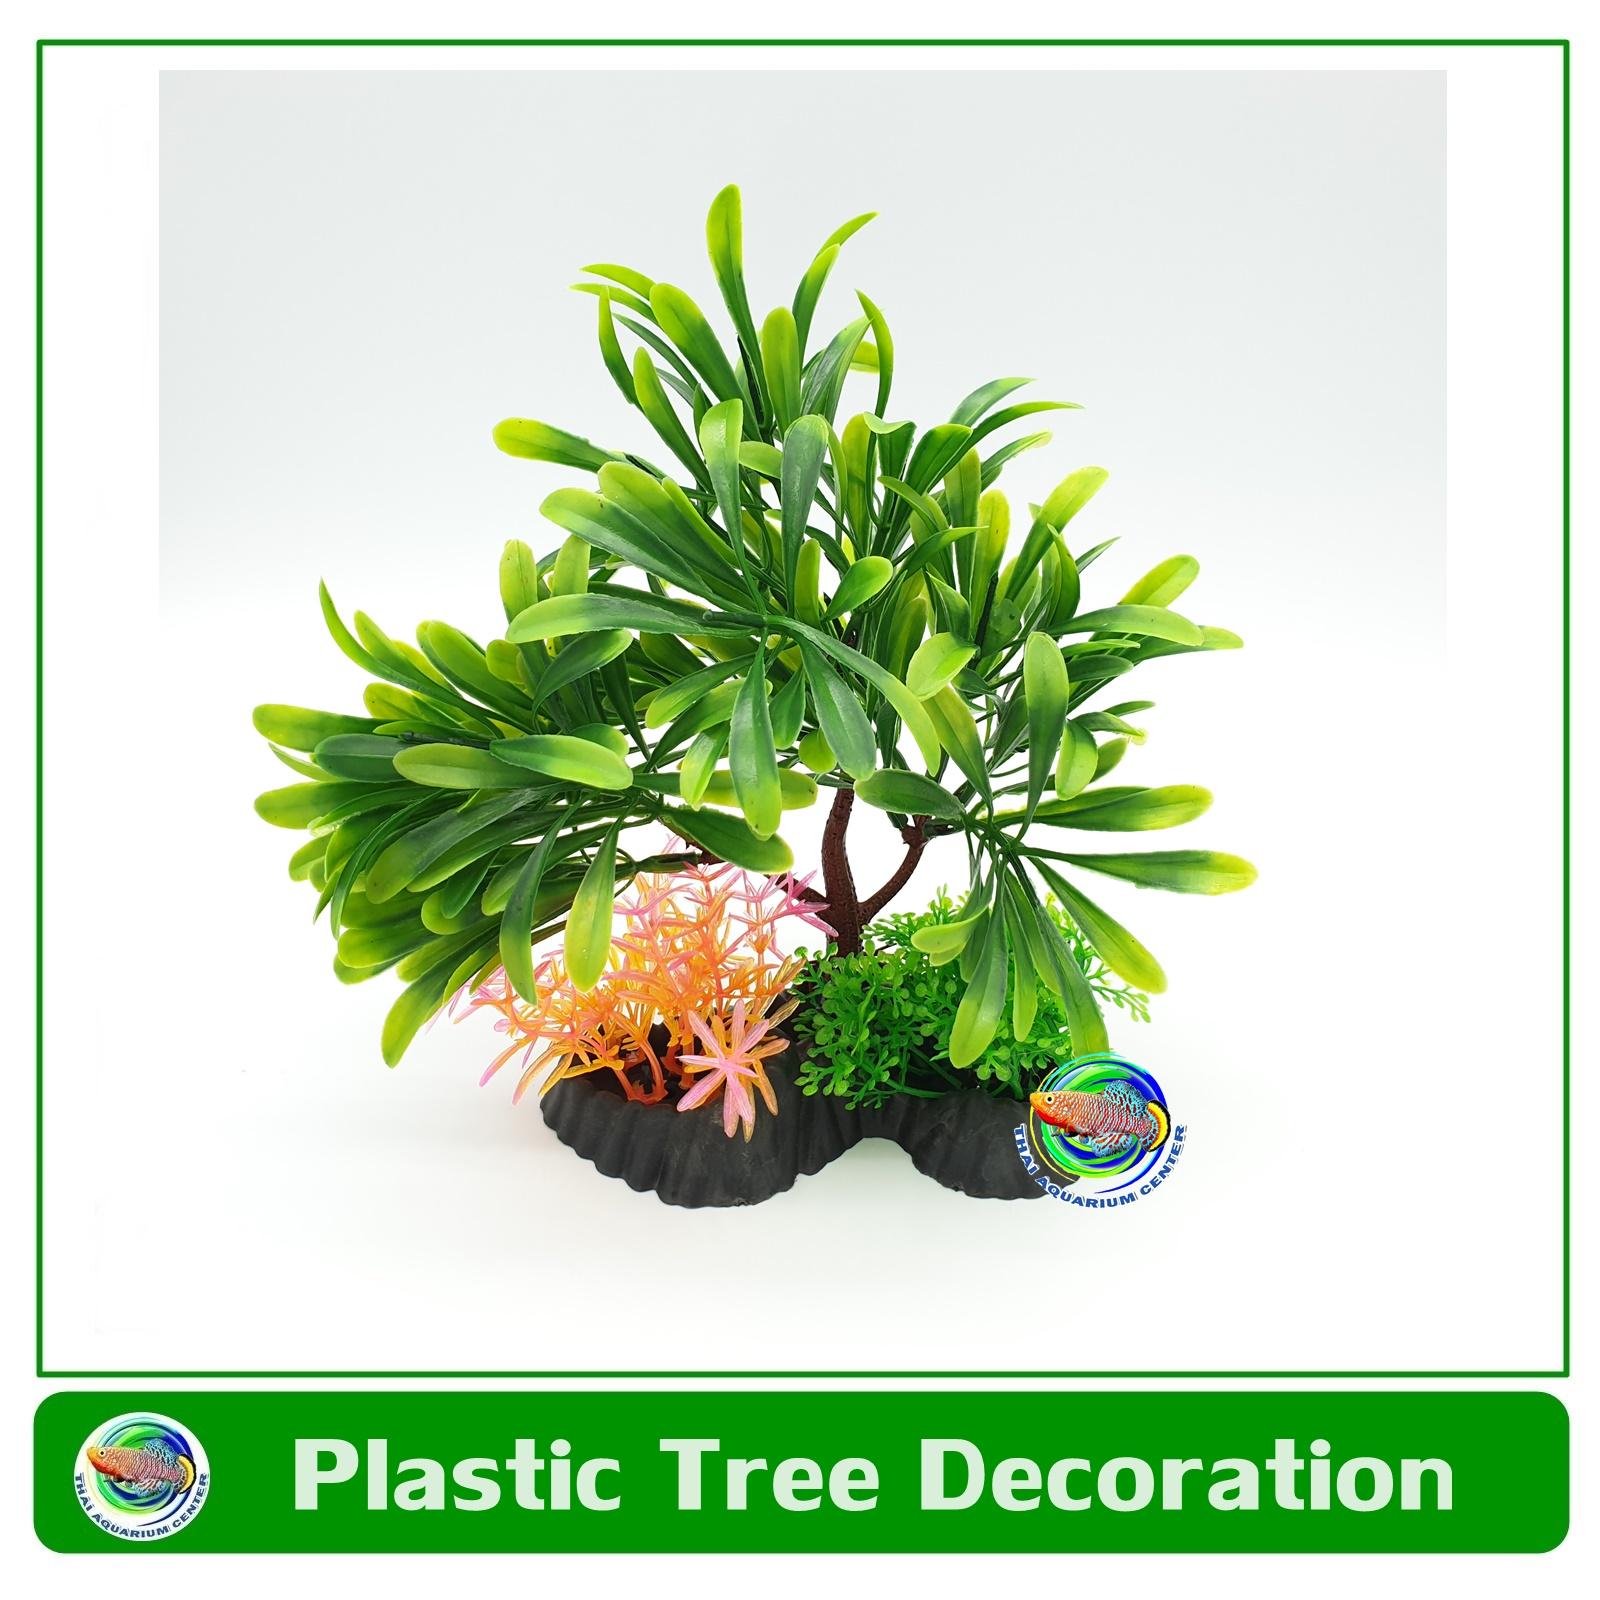 T043 ต้นไม้พลาสติก ใบเรียวยาว สีเขียวเข้ม ใช้ตกแต่งตู้ปลา Green colour Long Leaf Tree